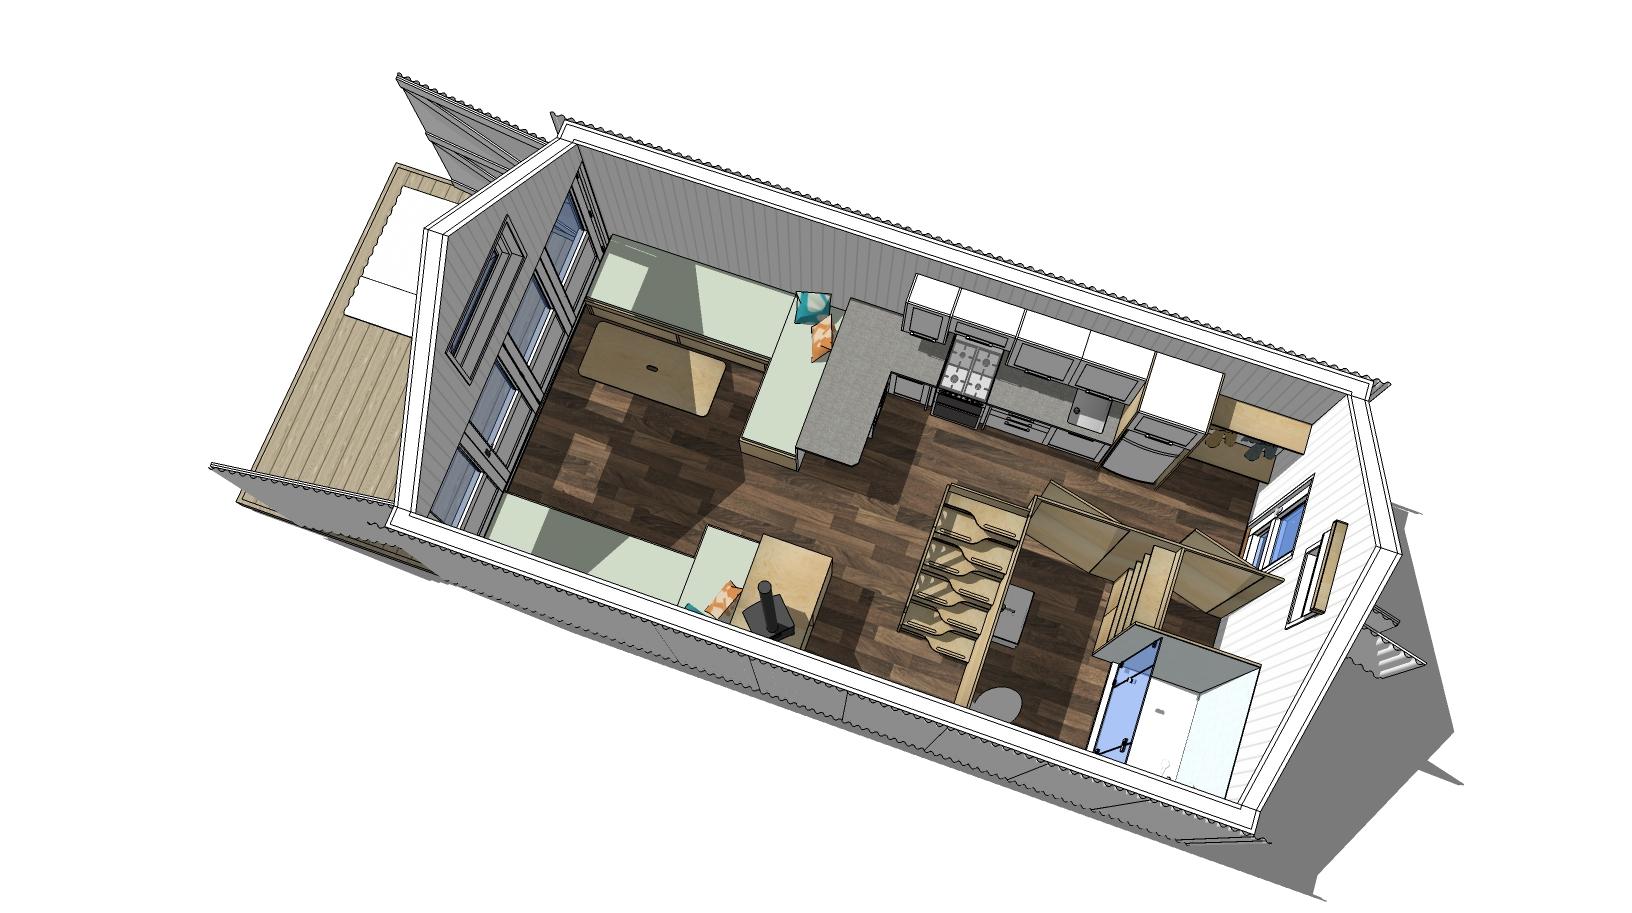 cadland estate 2x huts - 2.jpg